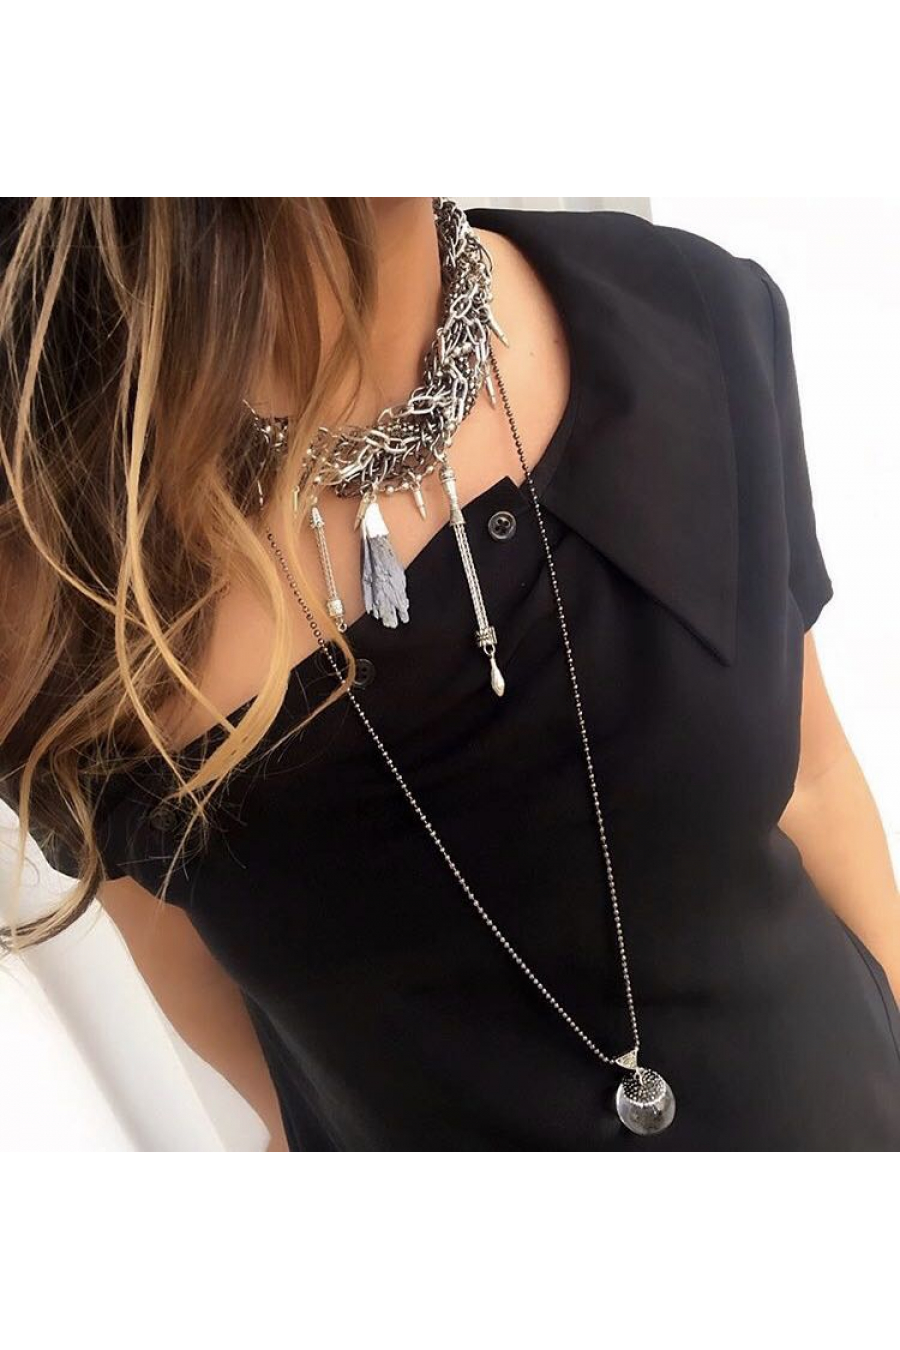 Crystal Rainy Beads